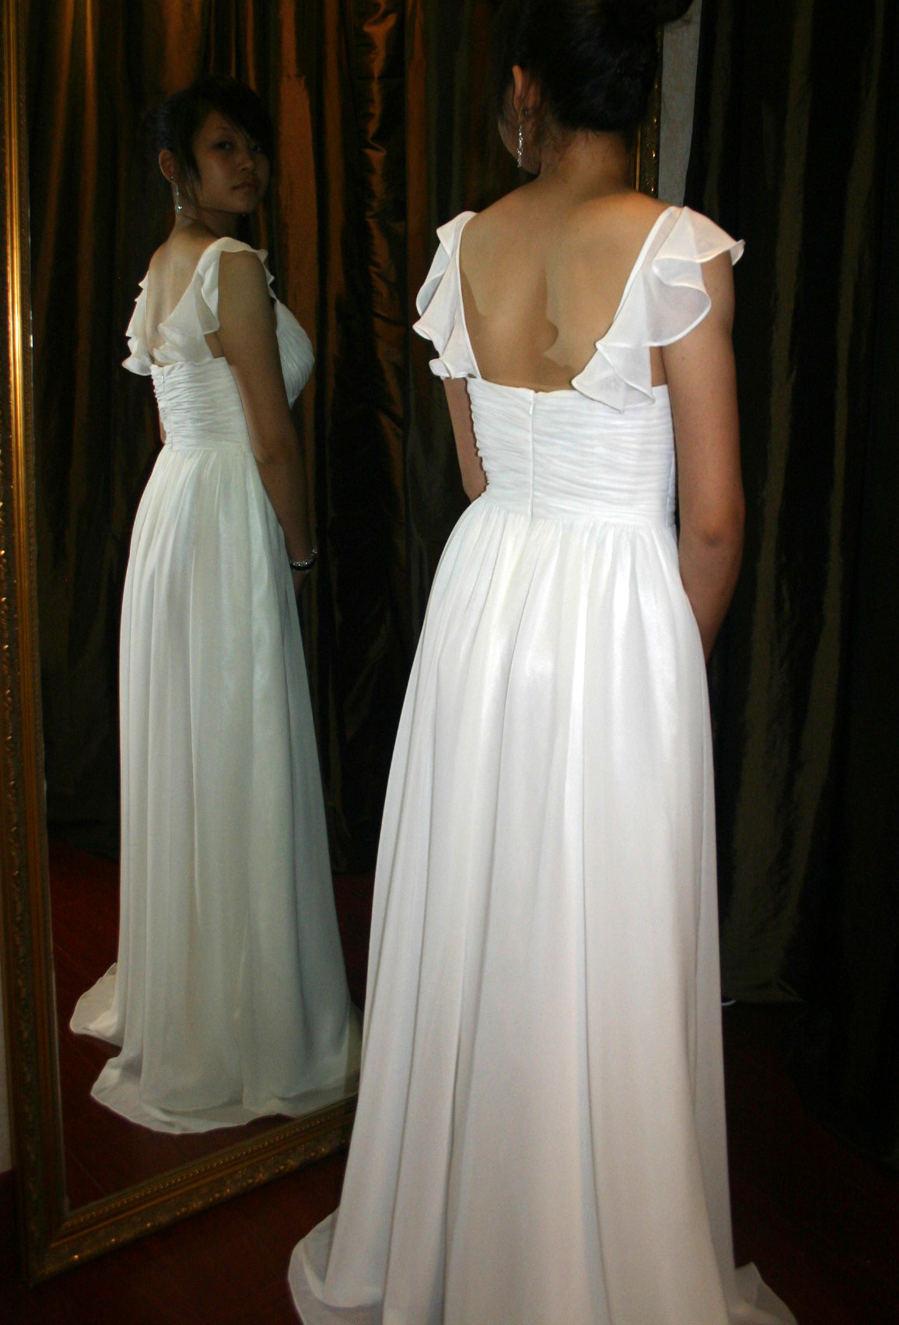 Destination wedding dresses dress inspiration for Dresses for destination wedding